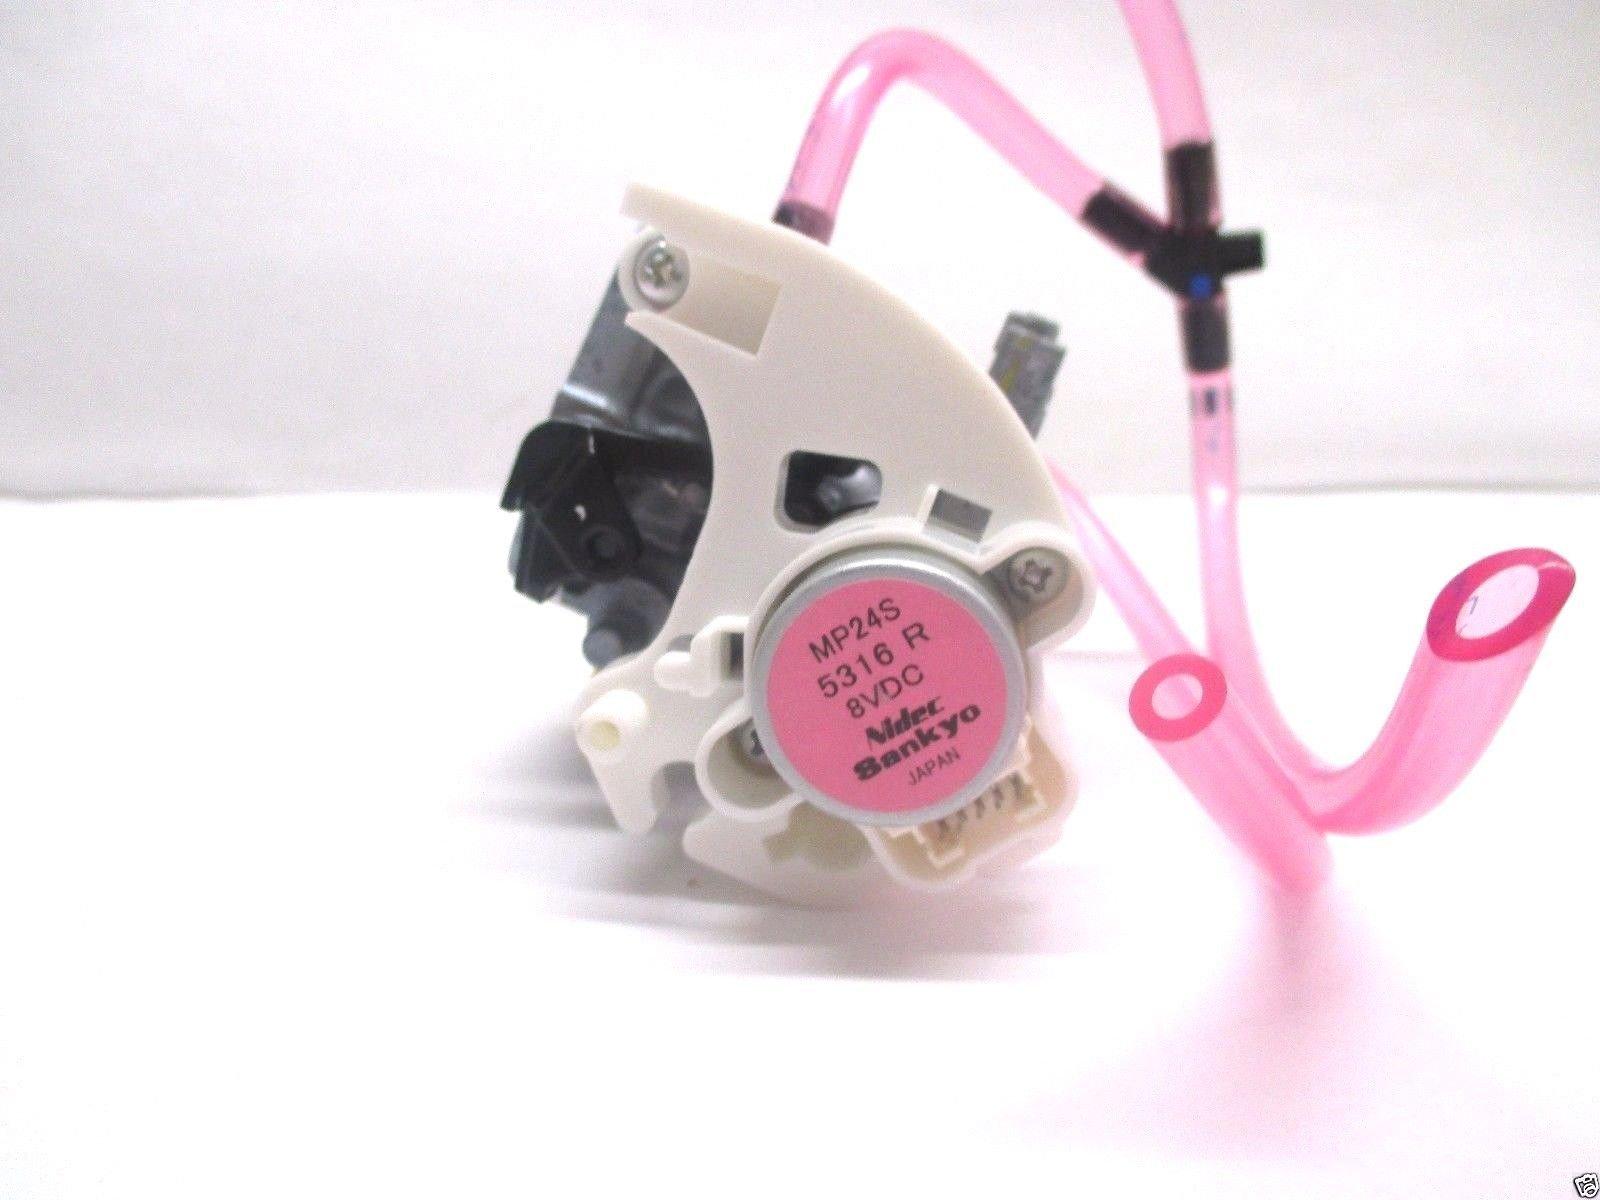 Honda Carburetor Assy. Part # 16100-ZL0-D66 by Honda (Image #2)